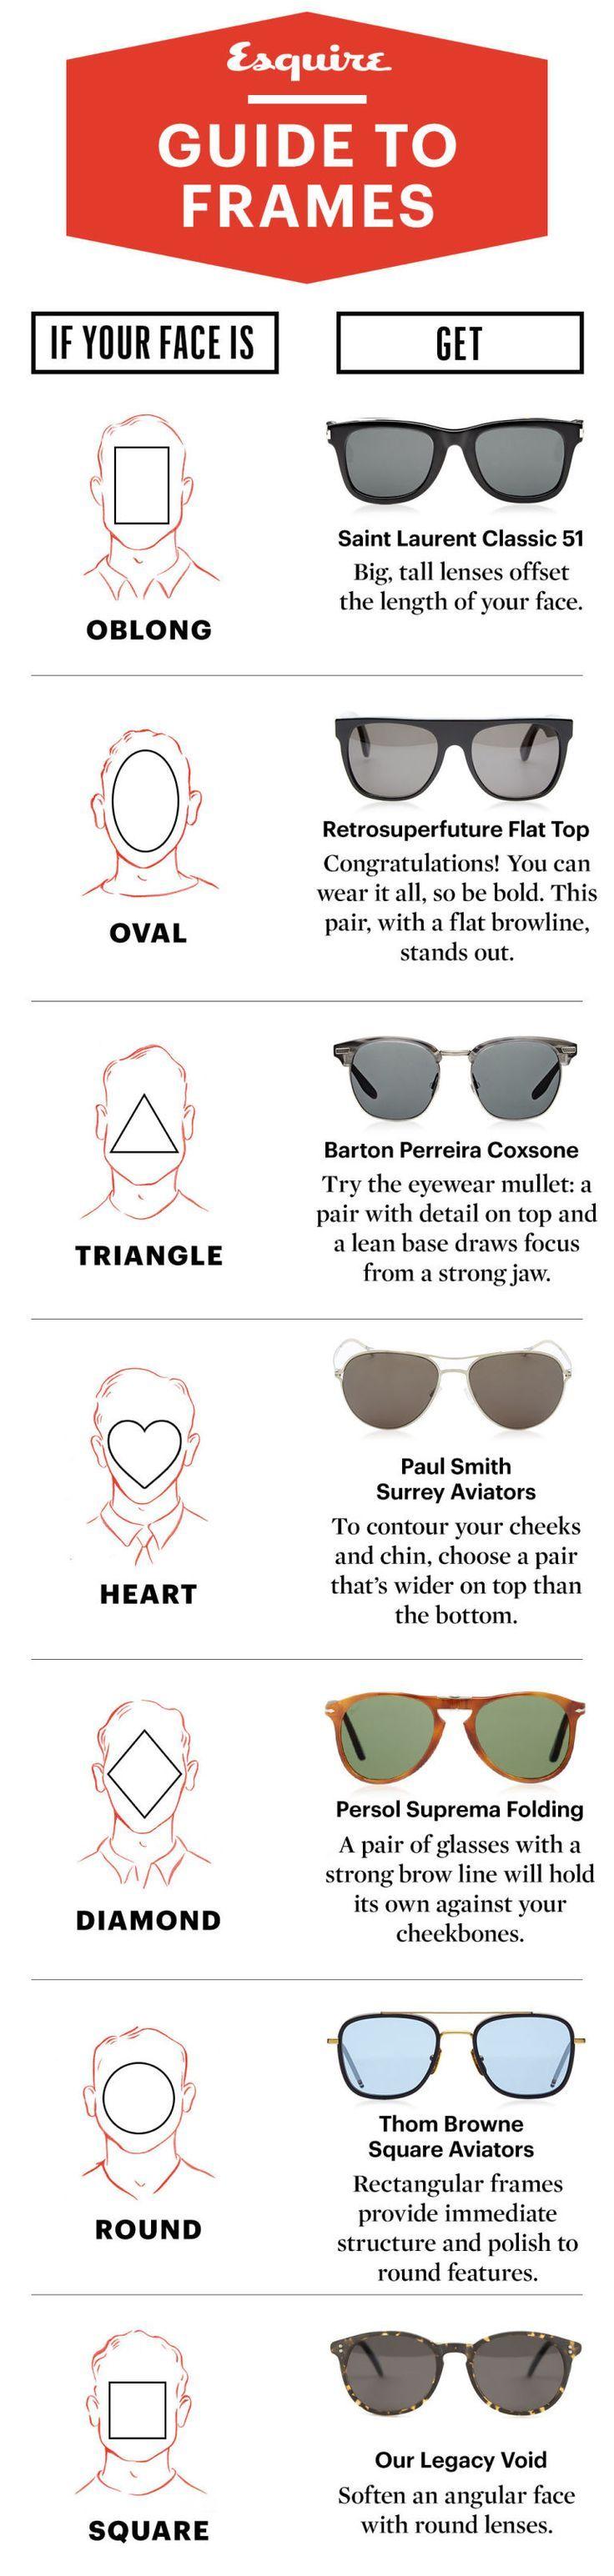 110 best Sartorial Wish List - Glasses images on Pinterest   Eye ...